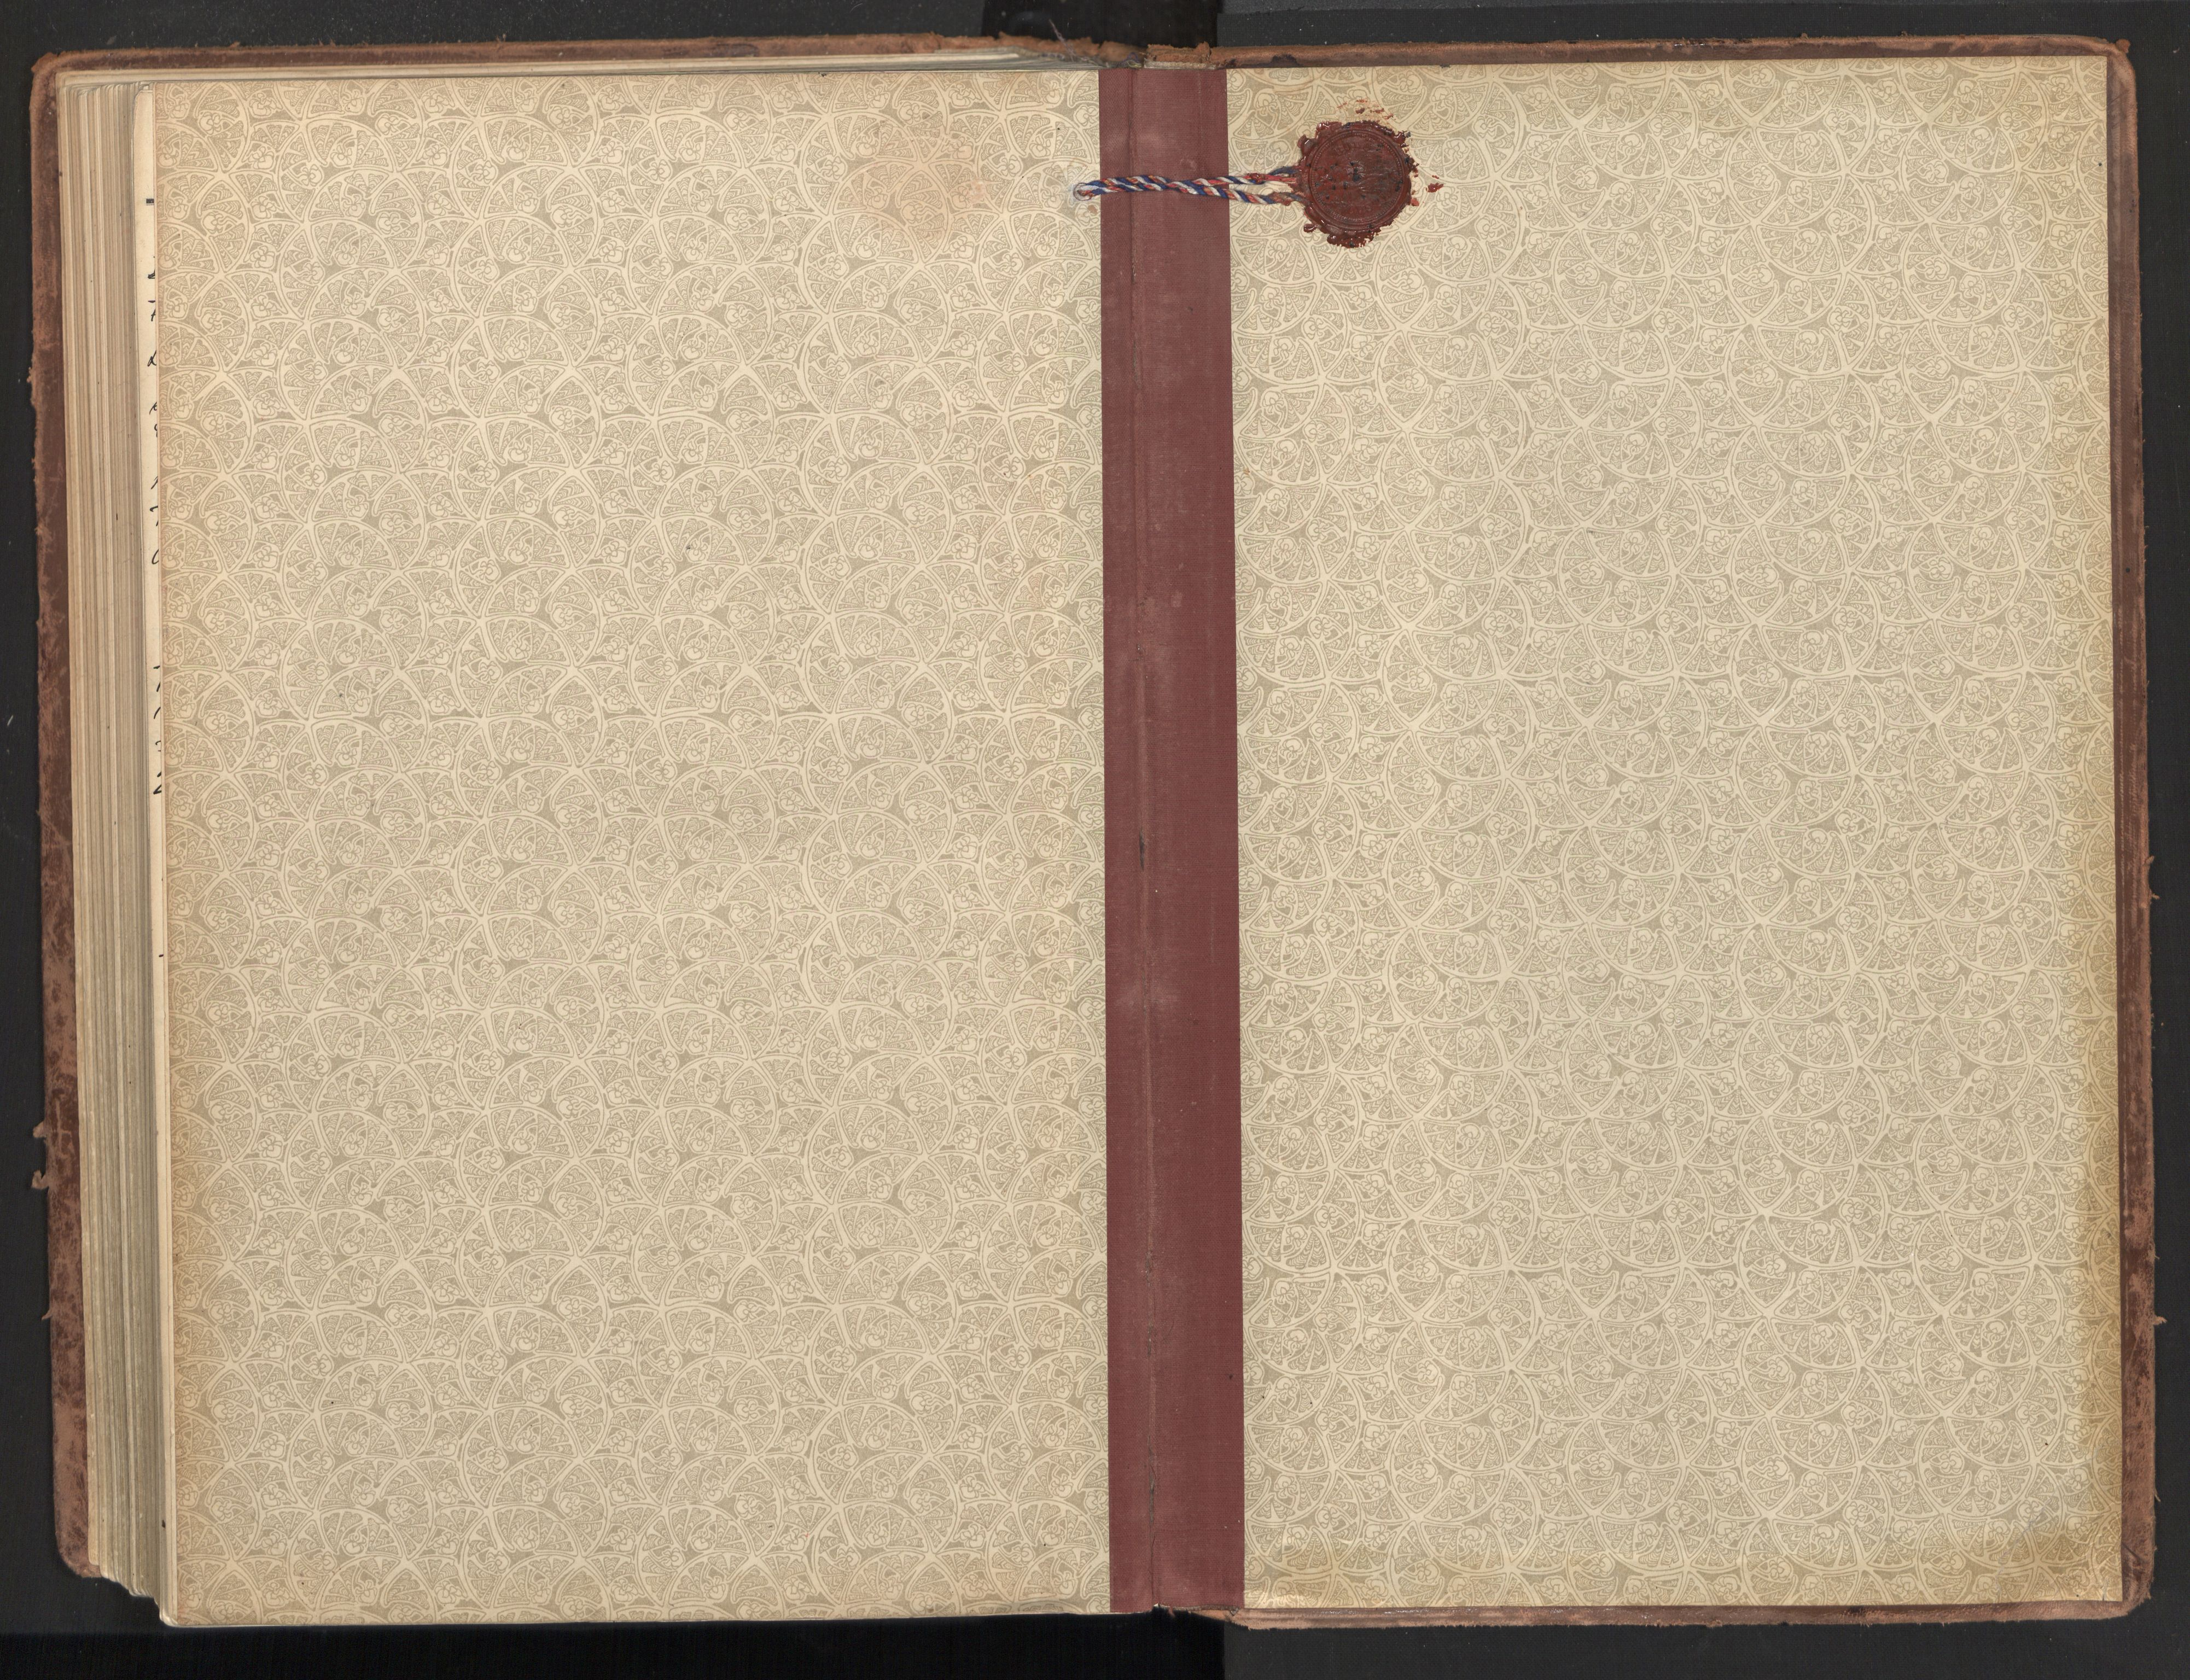 SAT, Ministerialprotokoller, klokkerbøker og fødselsregistre - Nordland, 801/L0018: Ministerialbok nr. 801A18, 1916-1930